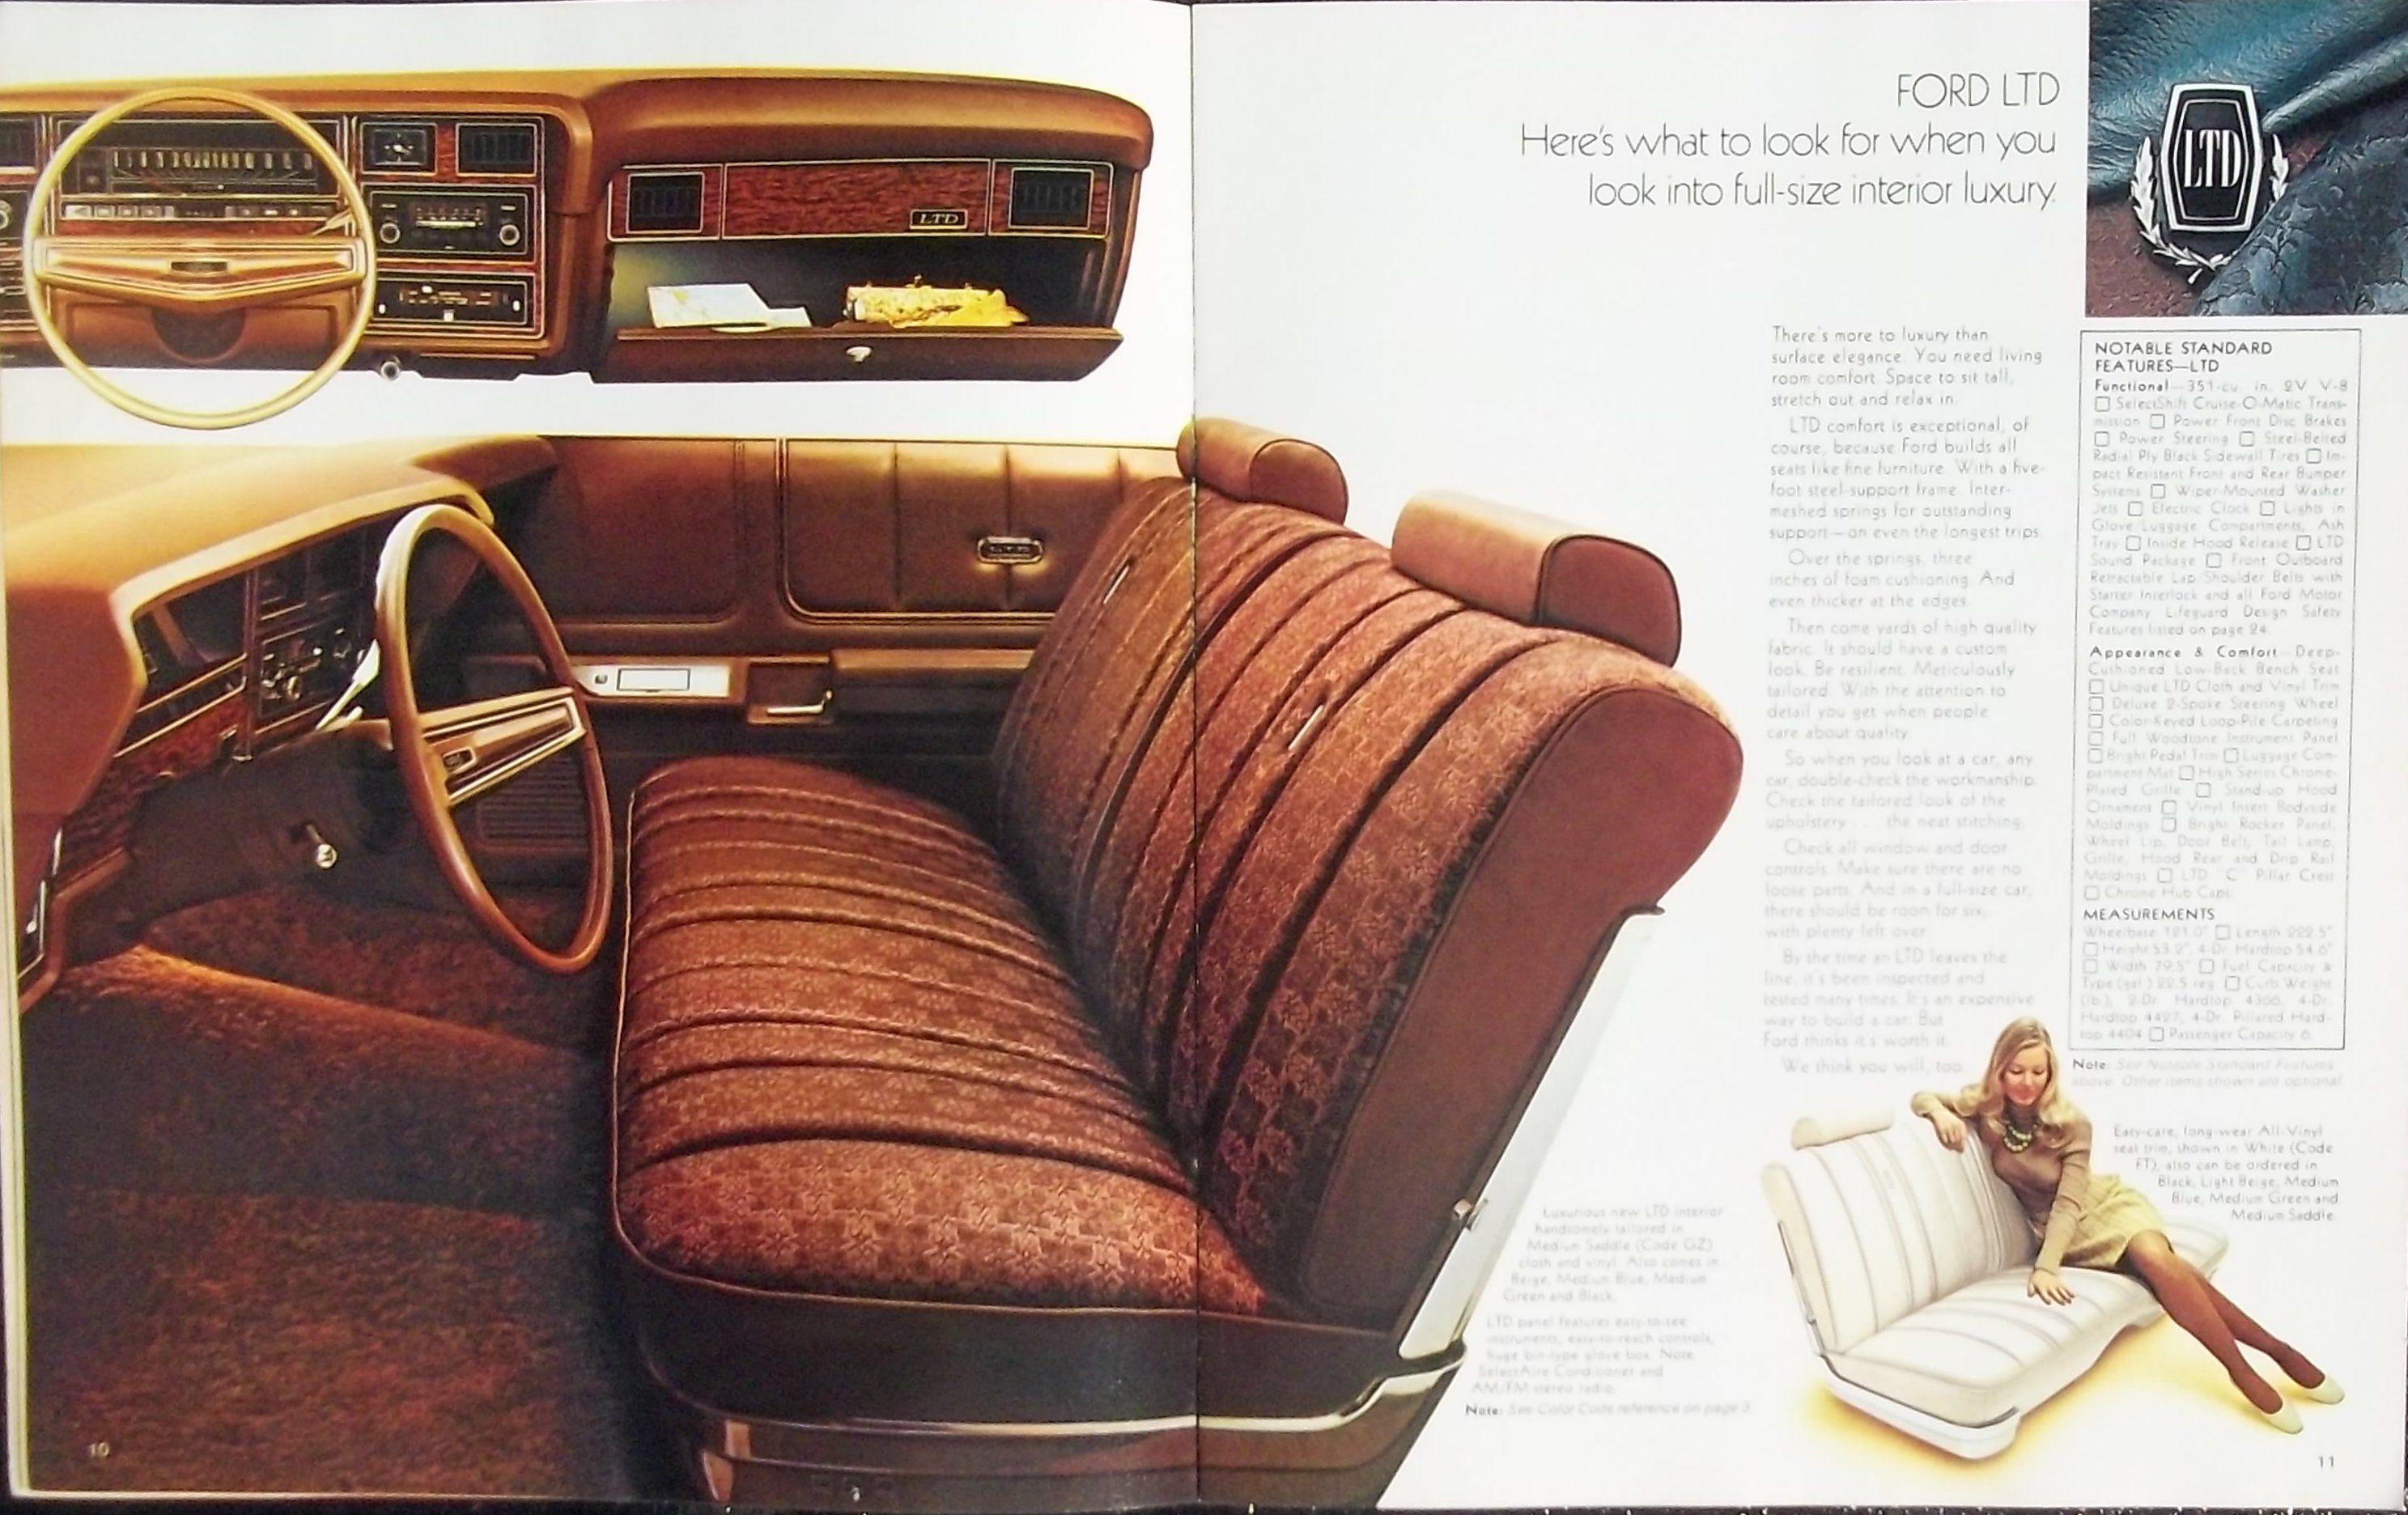 1974 Ford Ltd Brougham Ltd Galaxie 500 Custom 500 And Station Wagon Highlights Ford Ltd Car Advertising Ford